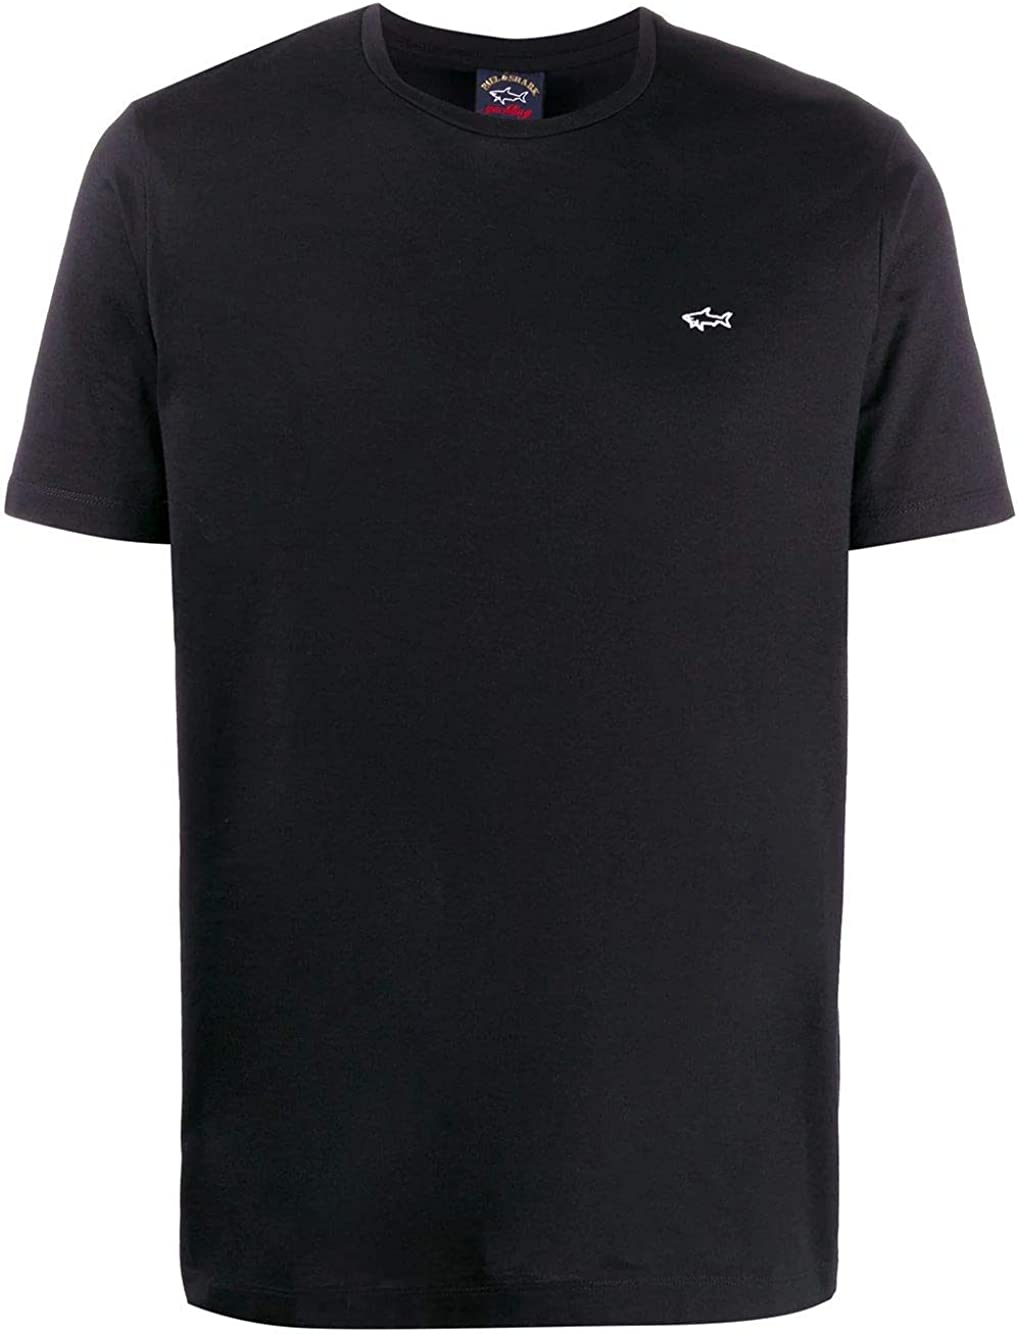 PAUL & SHARK Luxury Fashion Man E20P1074011 Black Cotton T-Shirt | Spring Summer 20